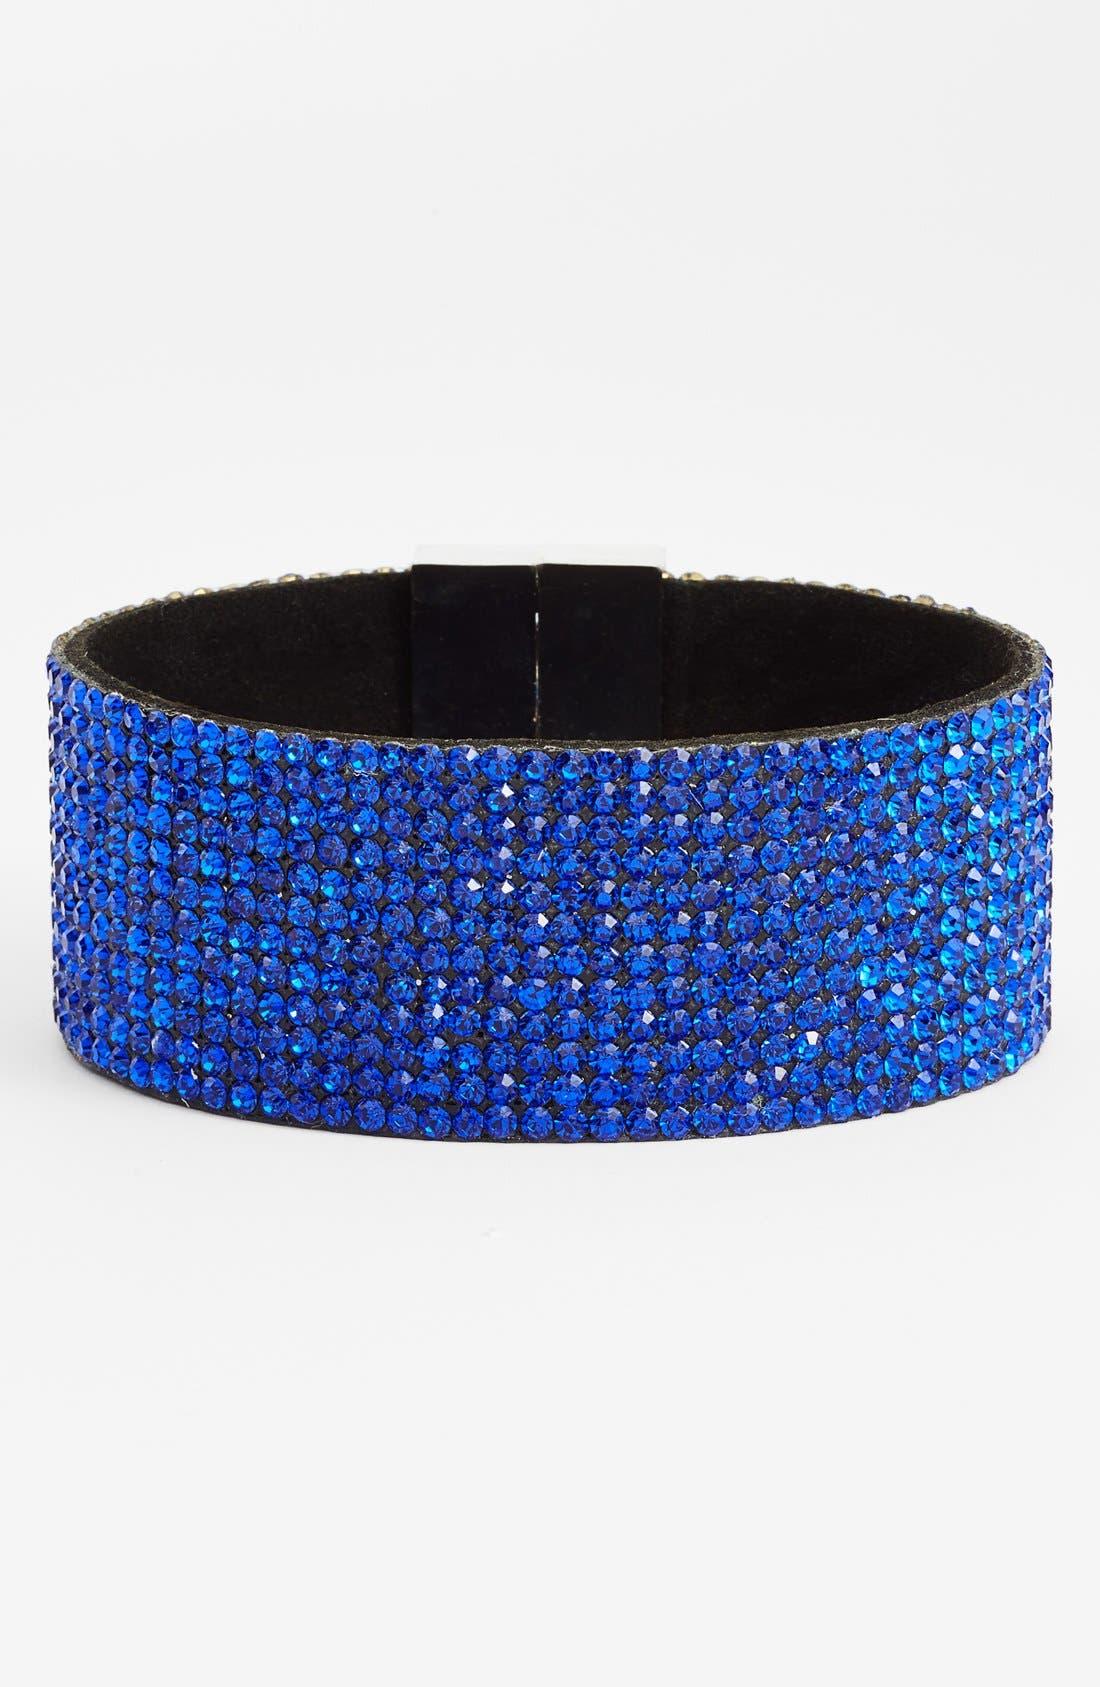 Alternate Image 1 Selected - Natasha Couture 'Dynasty' Magnetic Cuff Bracelet